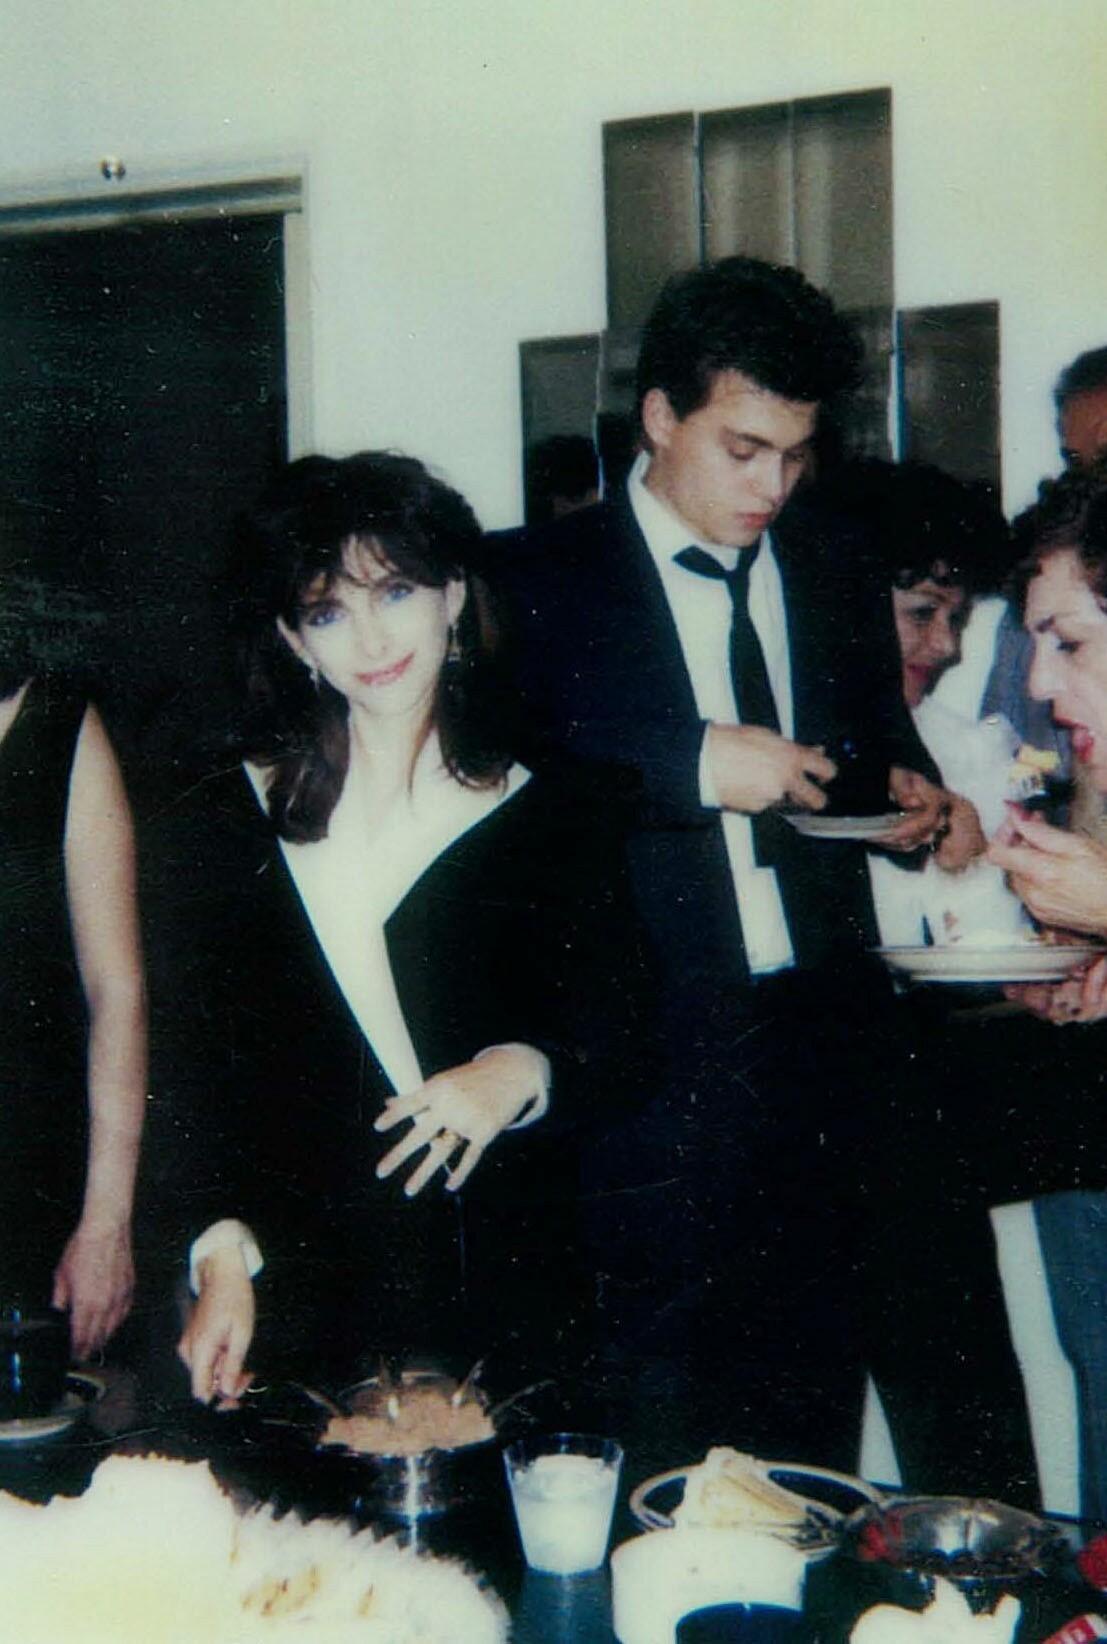 Wedding with Lori Anne Allison (1983)